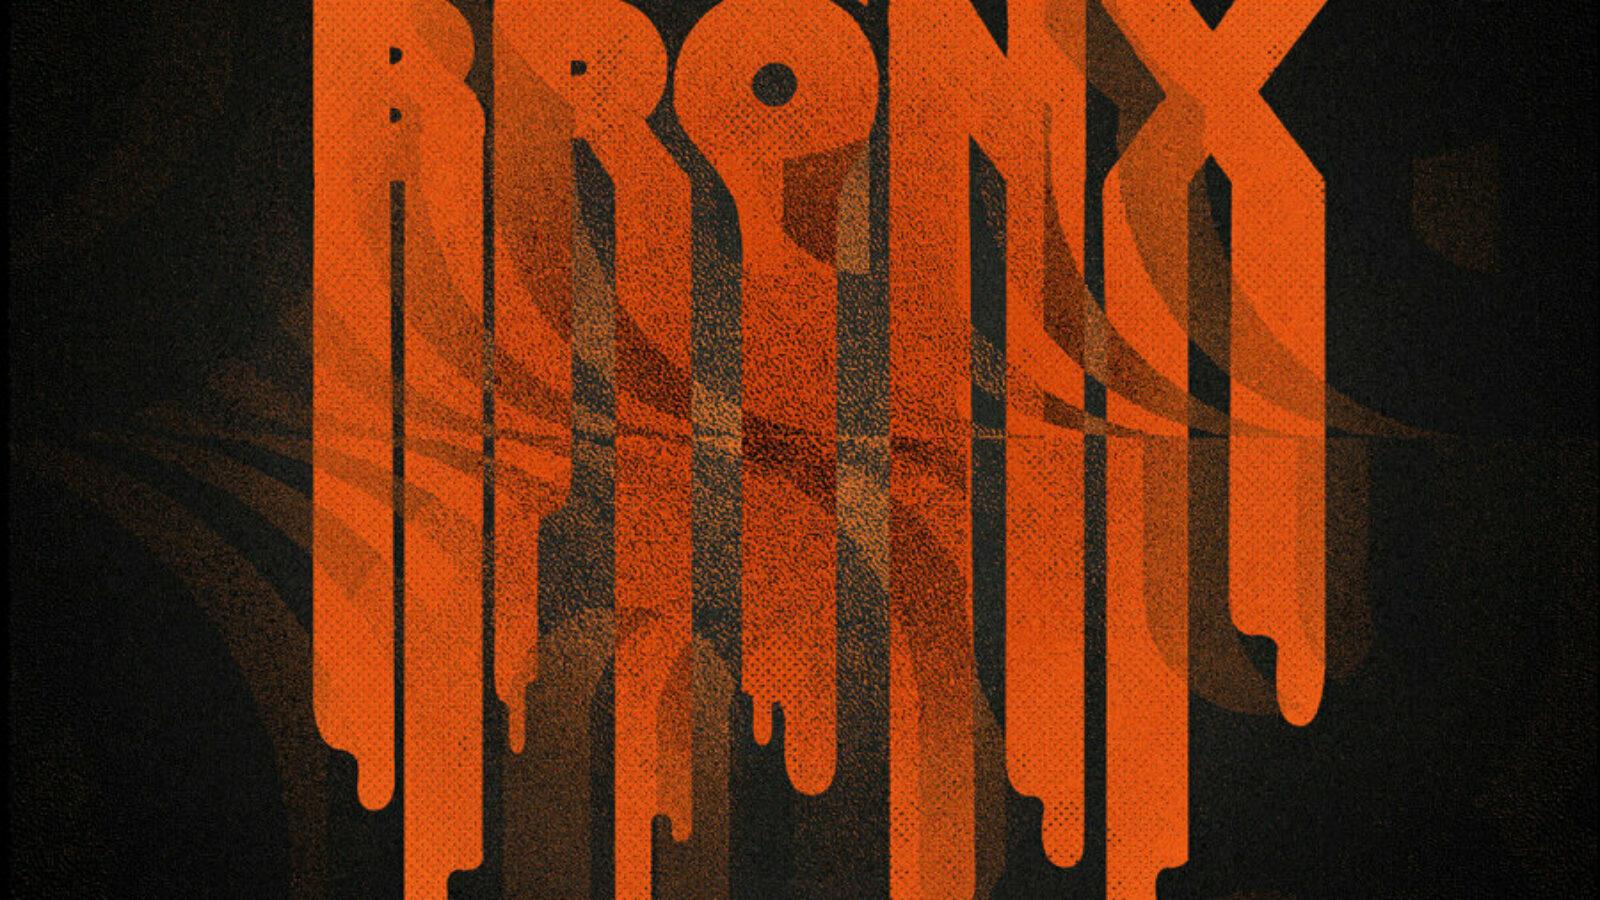 Top 10 CDs – THE BRONX